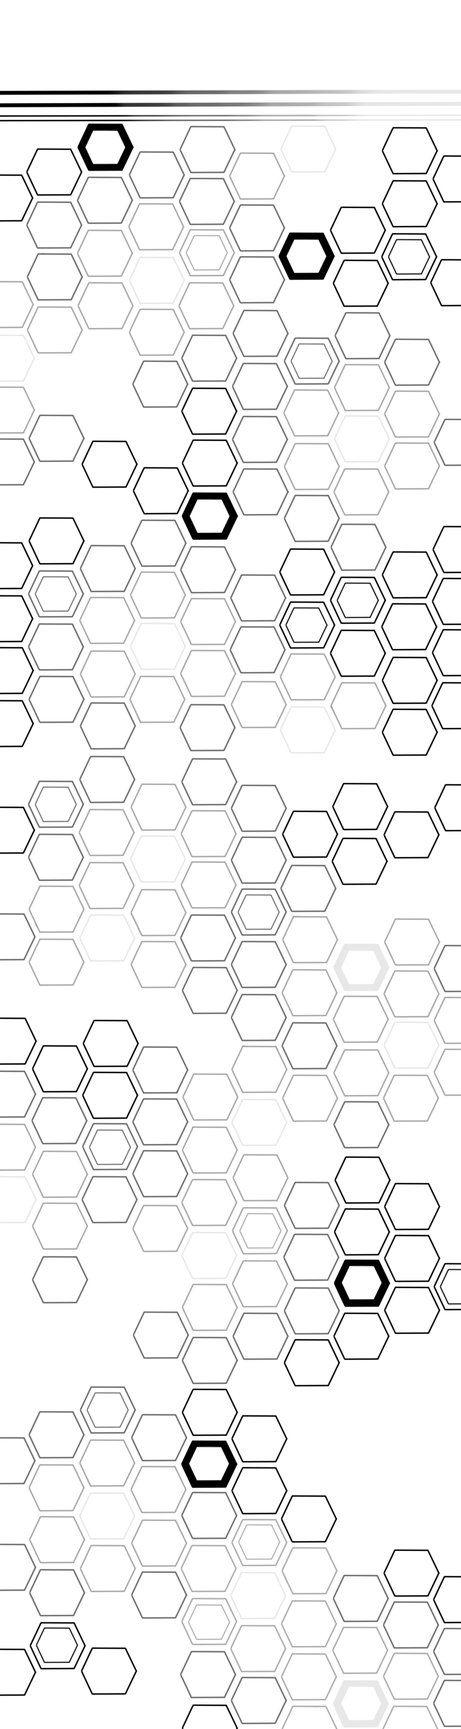 Simple Honeycomb by Kureiya on DeviantArt